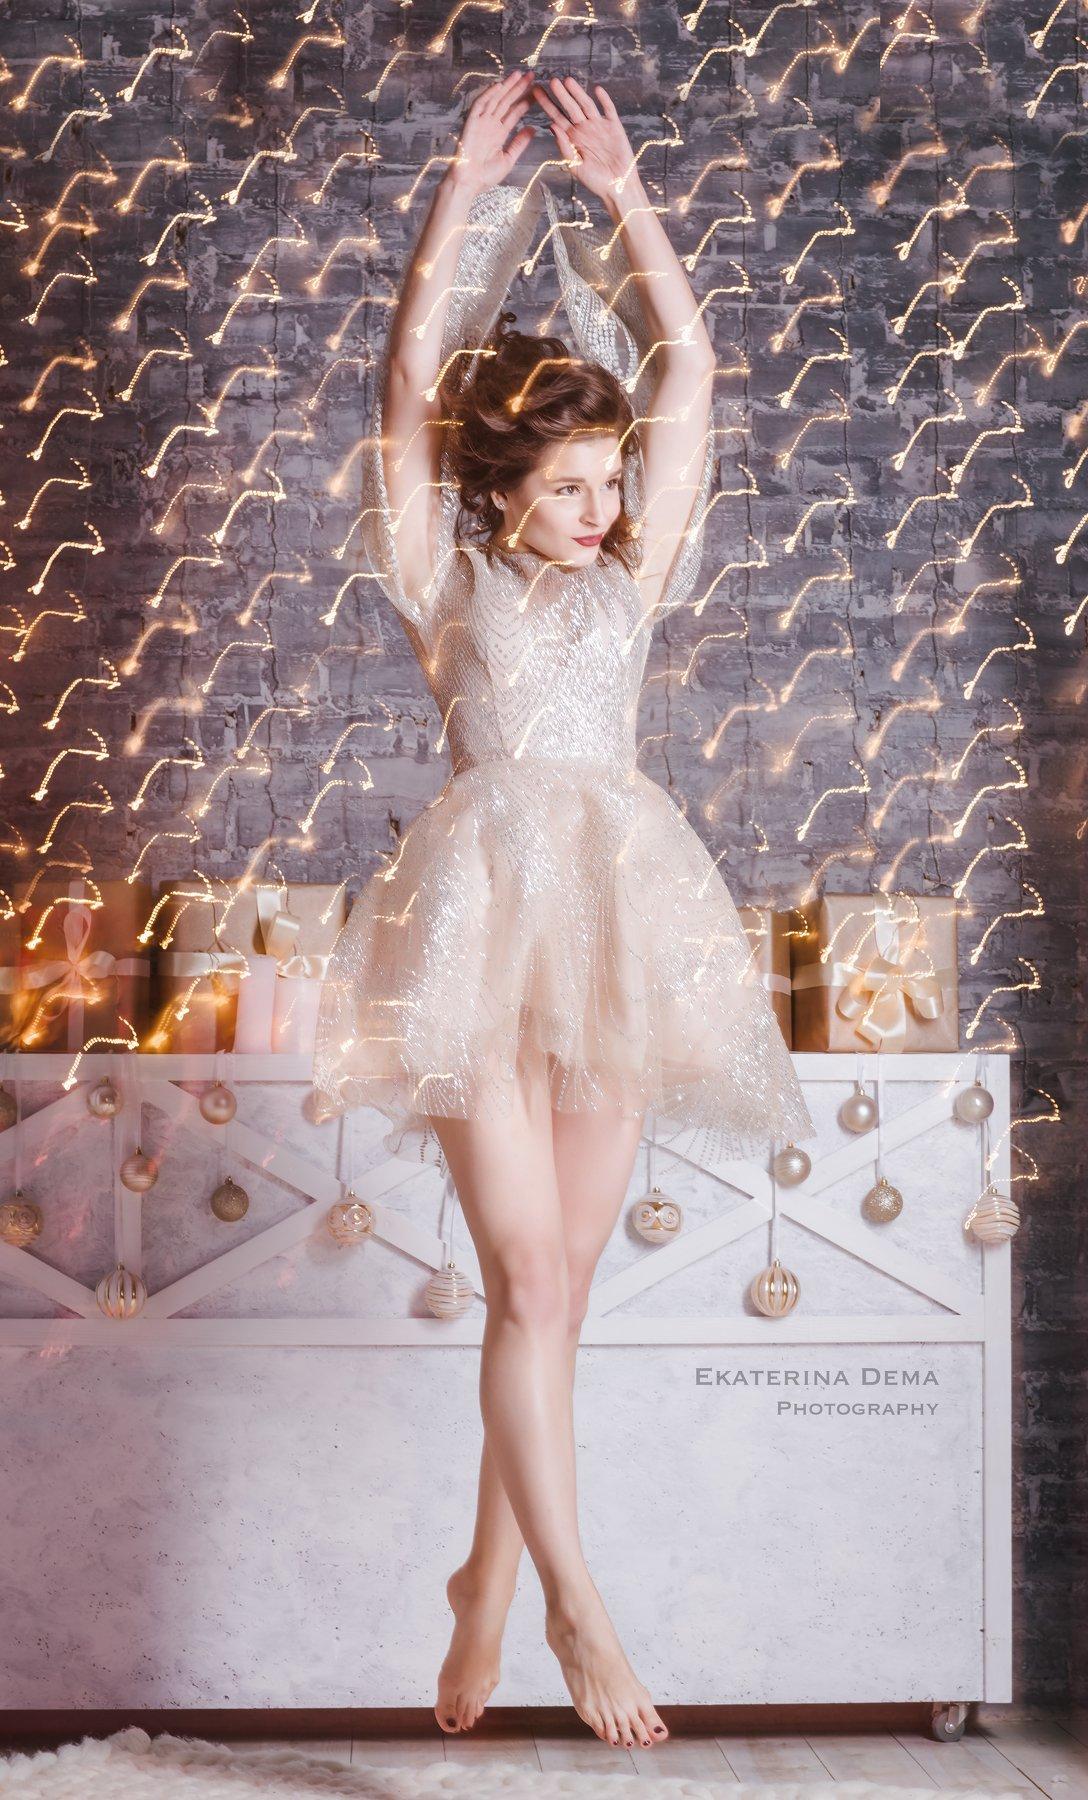 portrait, newyear, eyes, girl, woman, beauty, lights, holiday , Ekaterina Dema